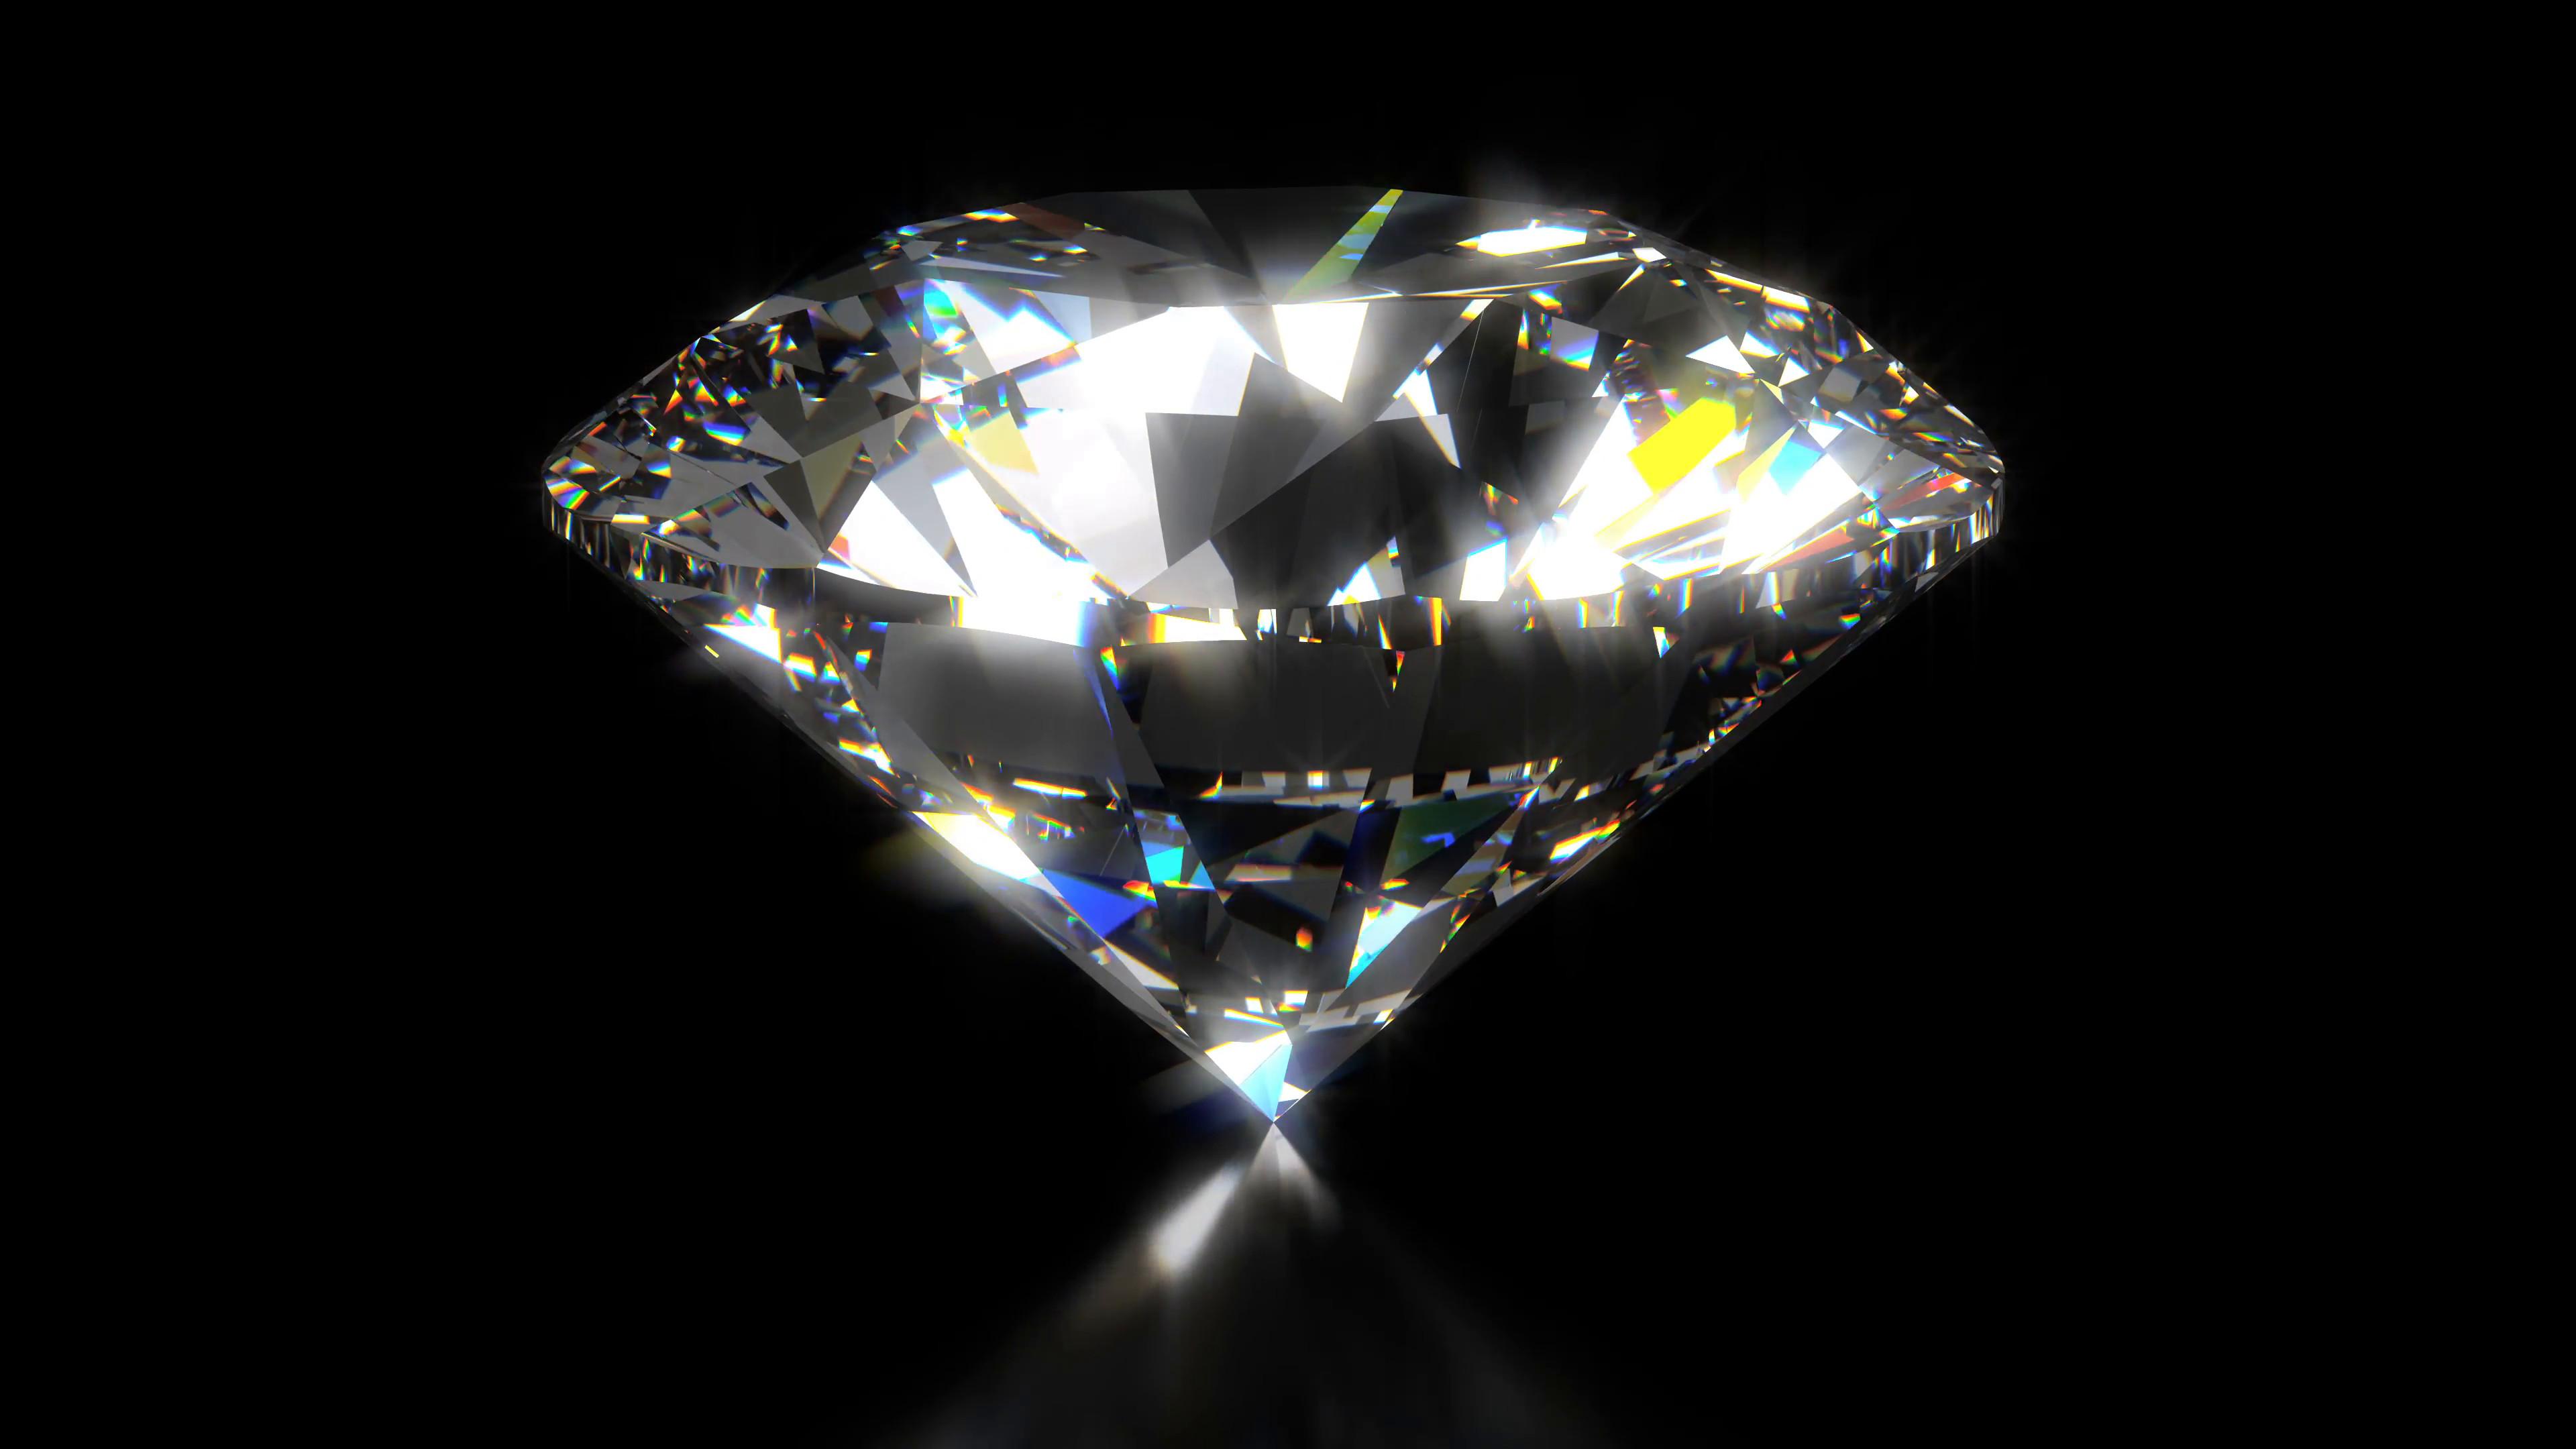 King Diamond Vintage Diamond 4k 1696146 Hd Wallpaper